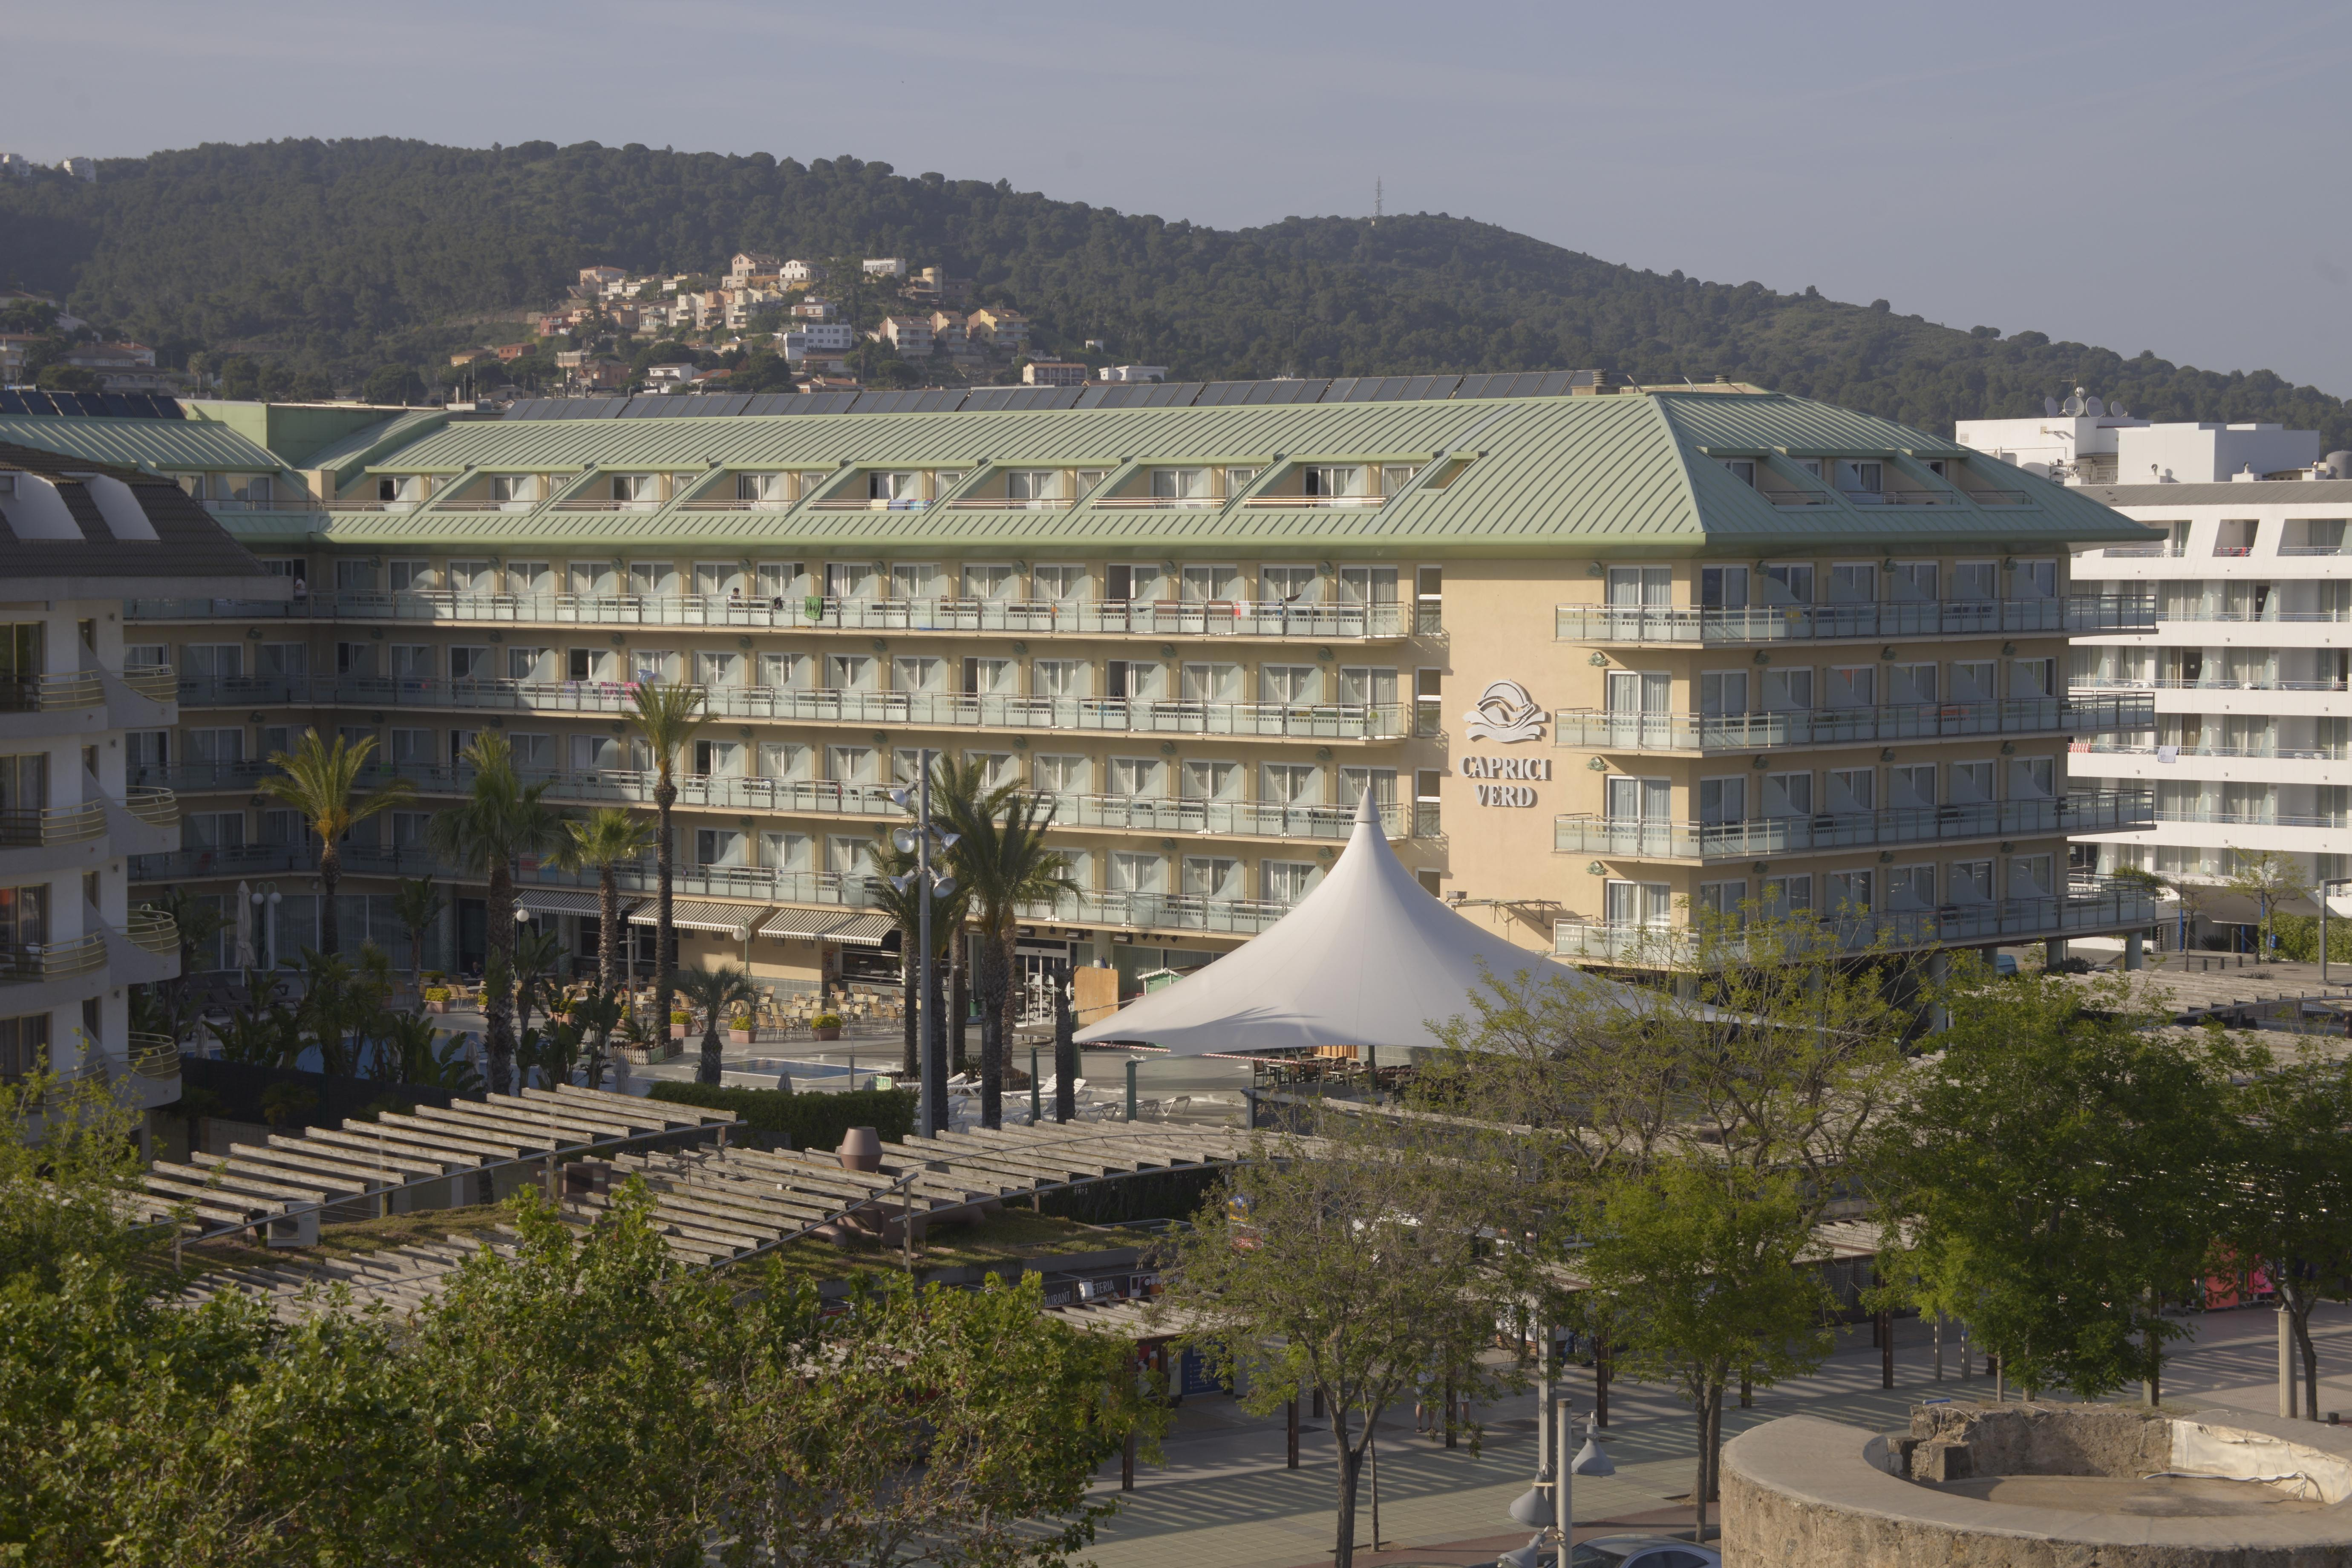 Alegria Caprici Verd Hotel Santa Susanna Desde 37 Logitravel